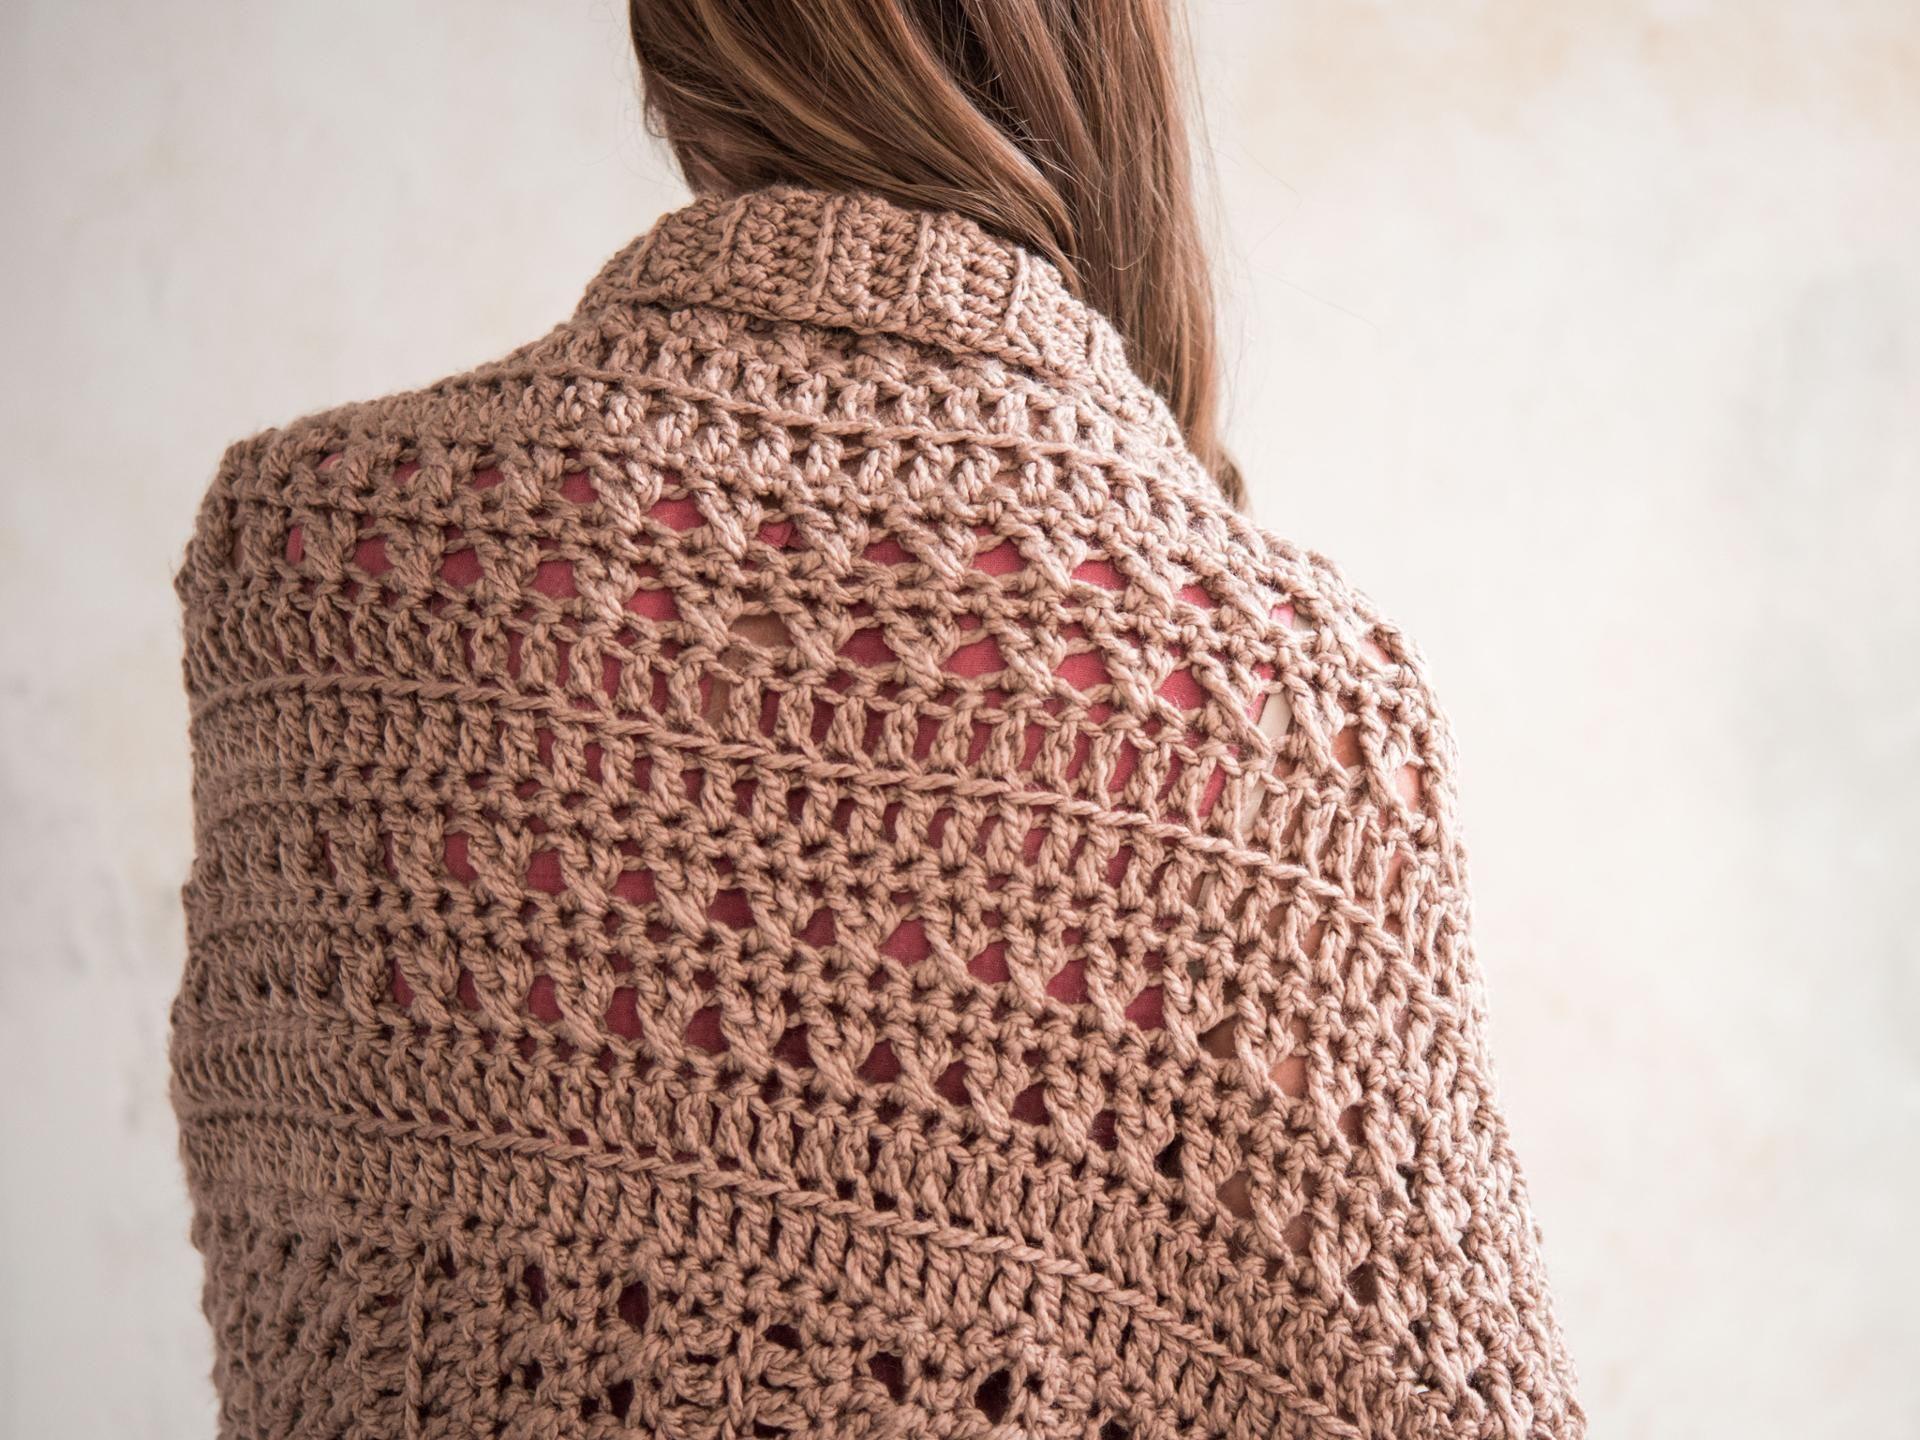 62dd4ff8222141 City Chic Shrug Crochet Kit